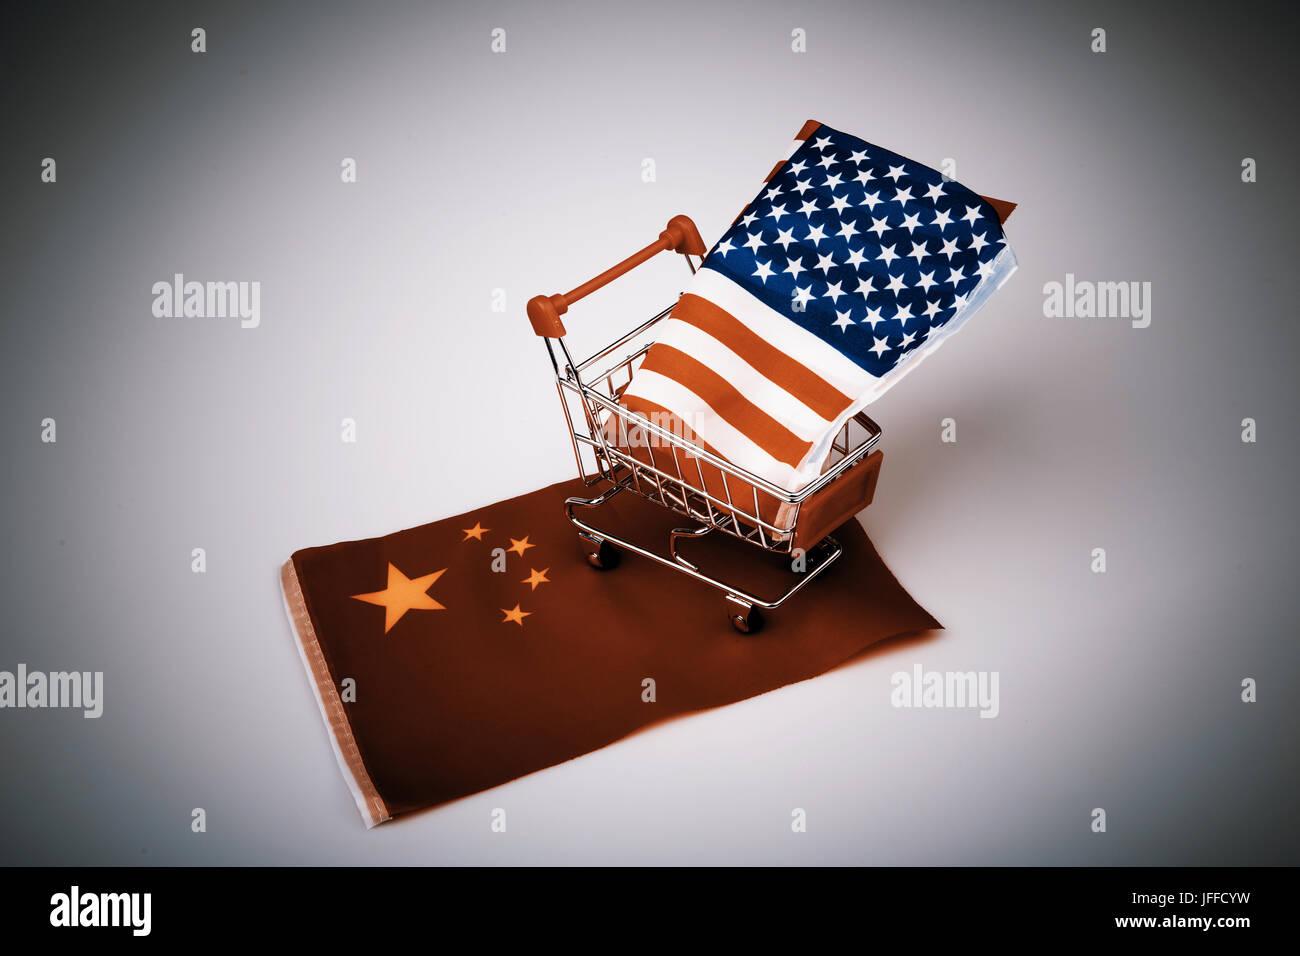 ping shopping cart with USA flag on China flag - China bought United states - Stock Image